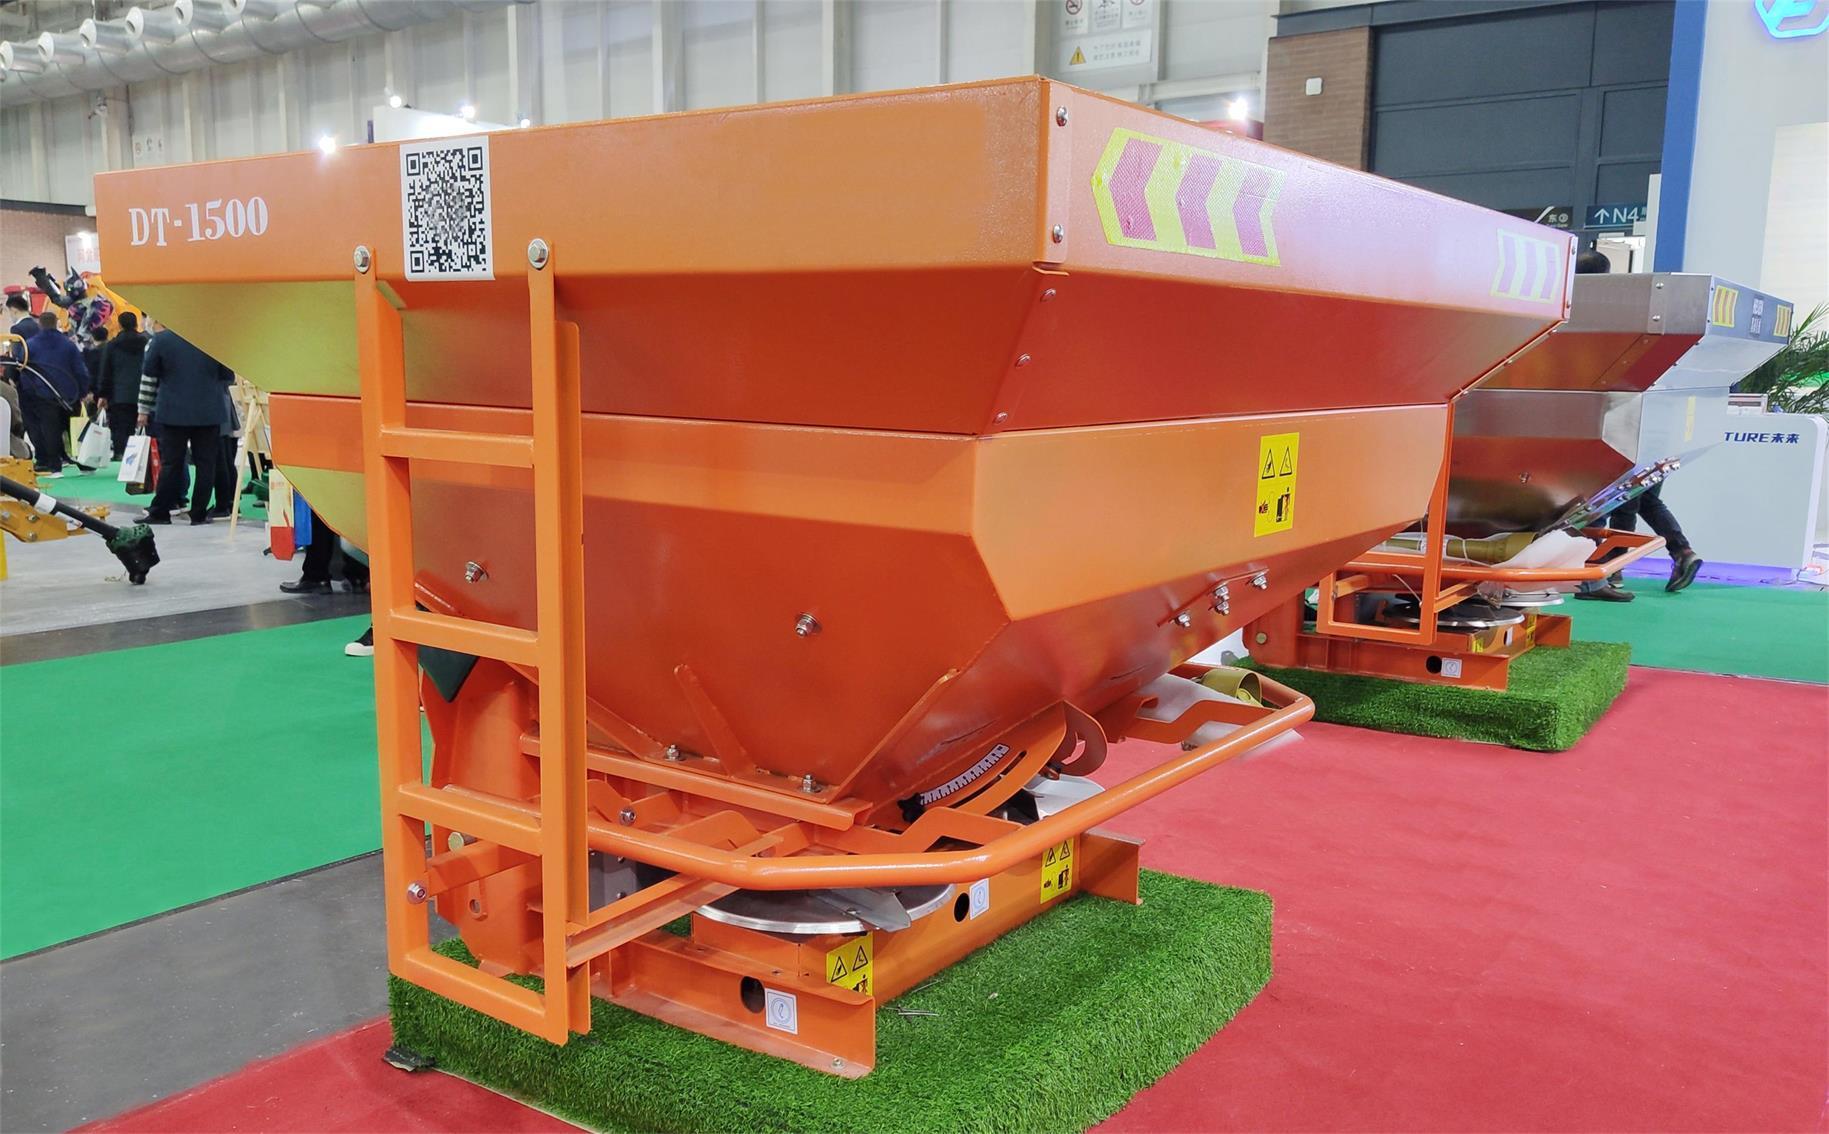 Tractor mounted fertilizer spreader